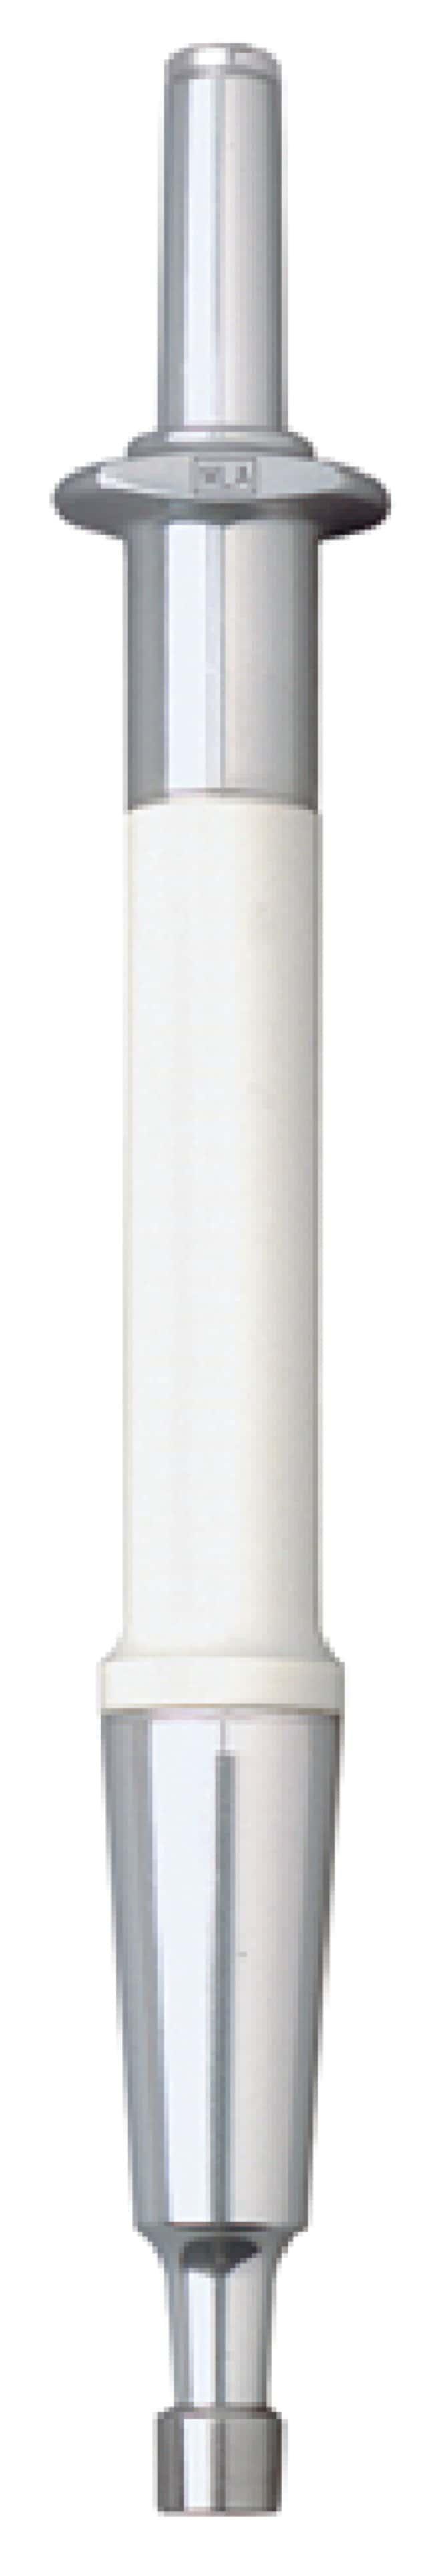 VistaLab™ TechnologiesMLA™ Brand Macro Pipetters Volume: 4mL; Barrel color: White VistaLab™ TechnologiesMLA™ Brand Macro Pipetters